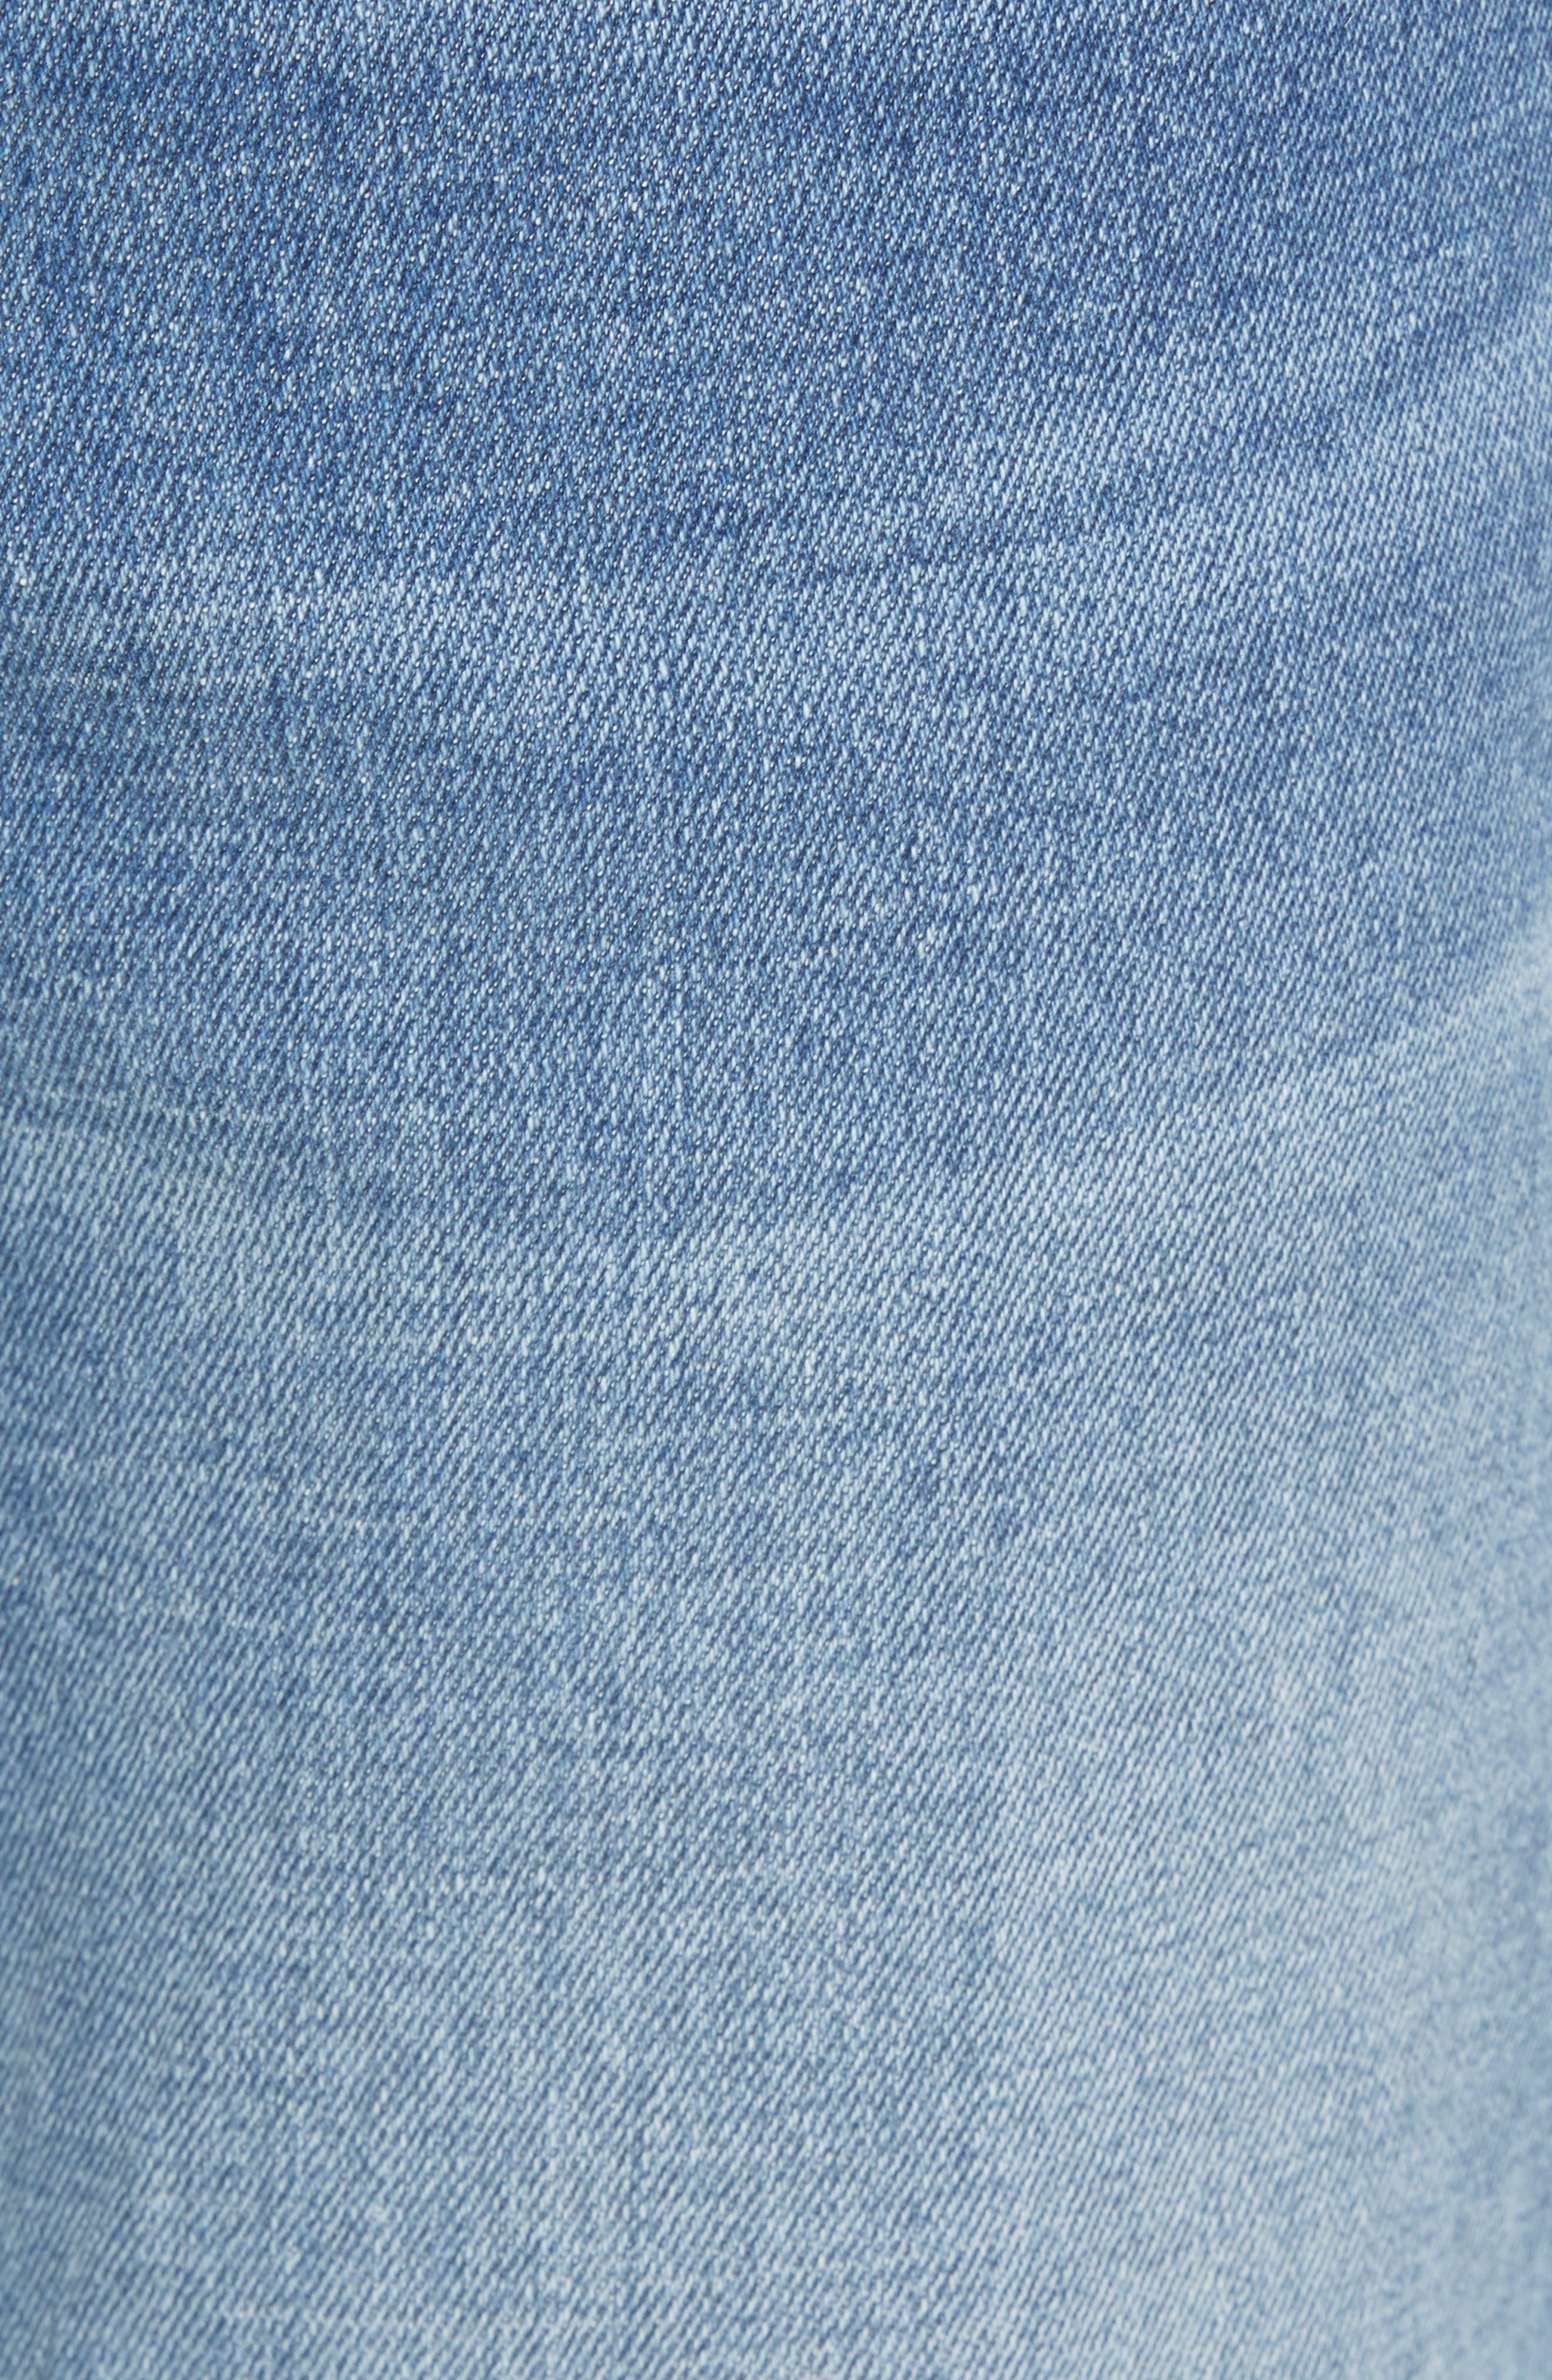 Skinny Moto Jeans,                             Alternate thumbnail 5, color,                             BLUE RIVERS WASH